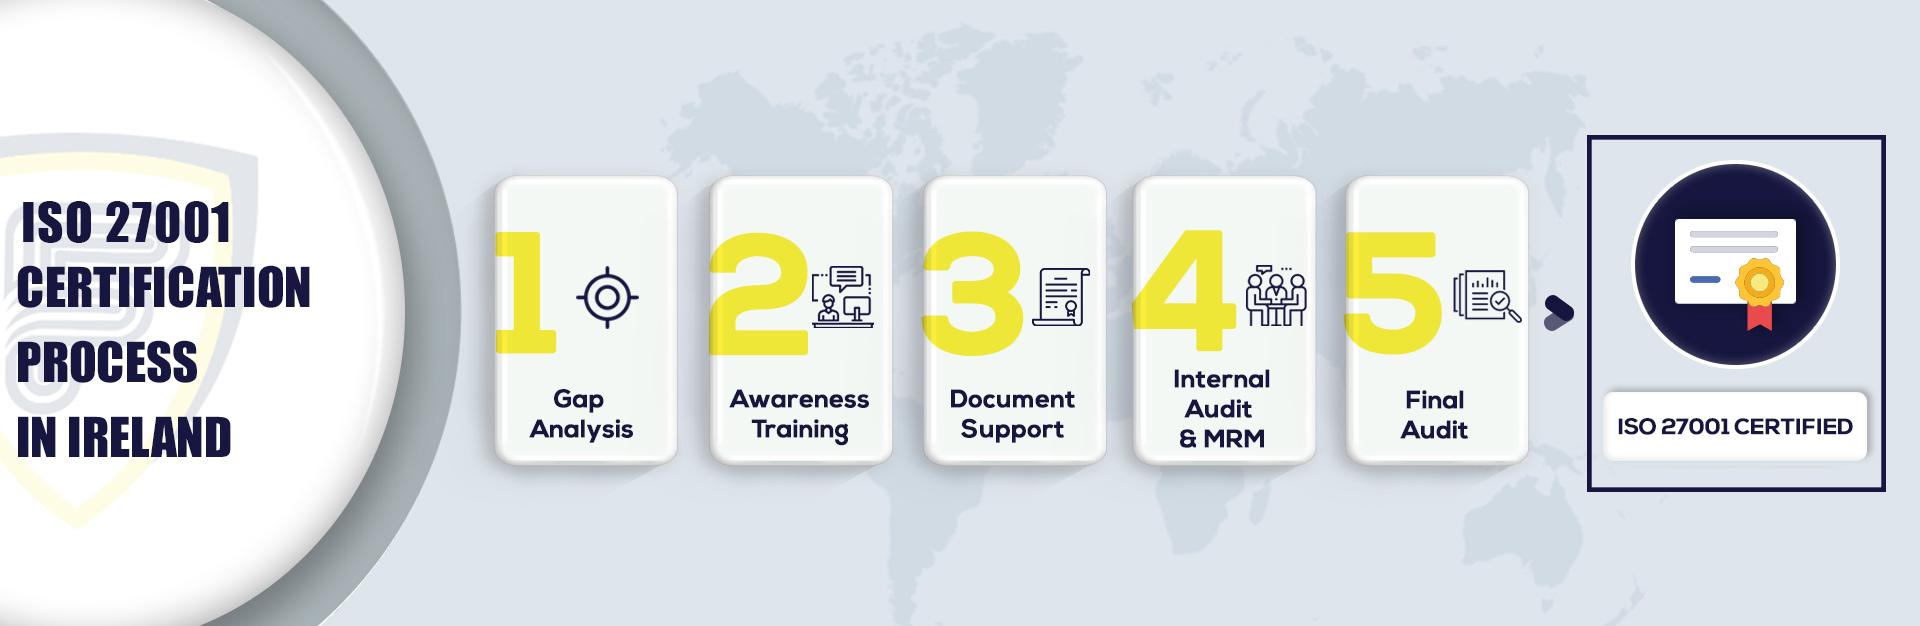 ISO 27001 Certification in Ireland